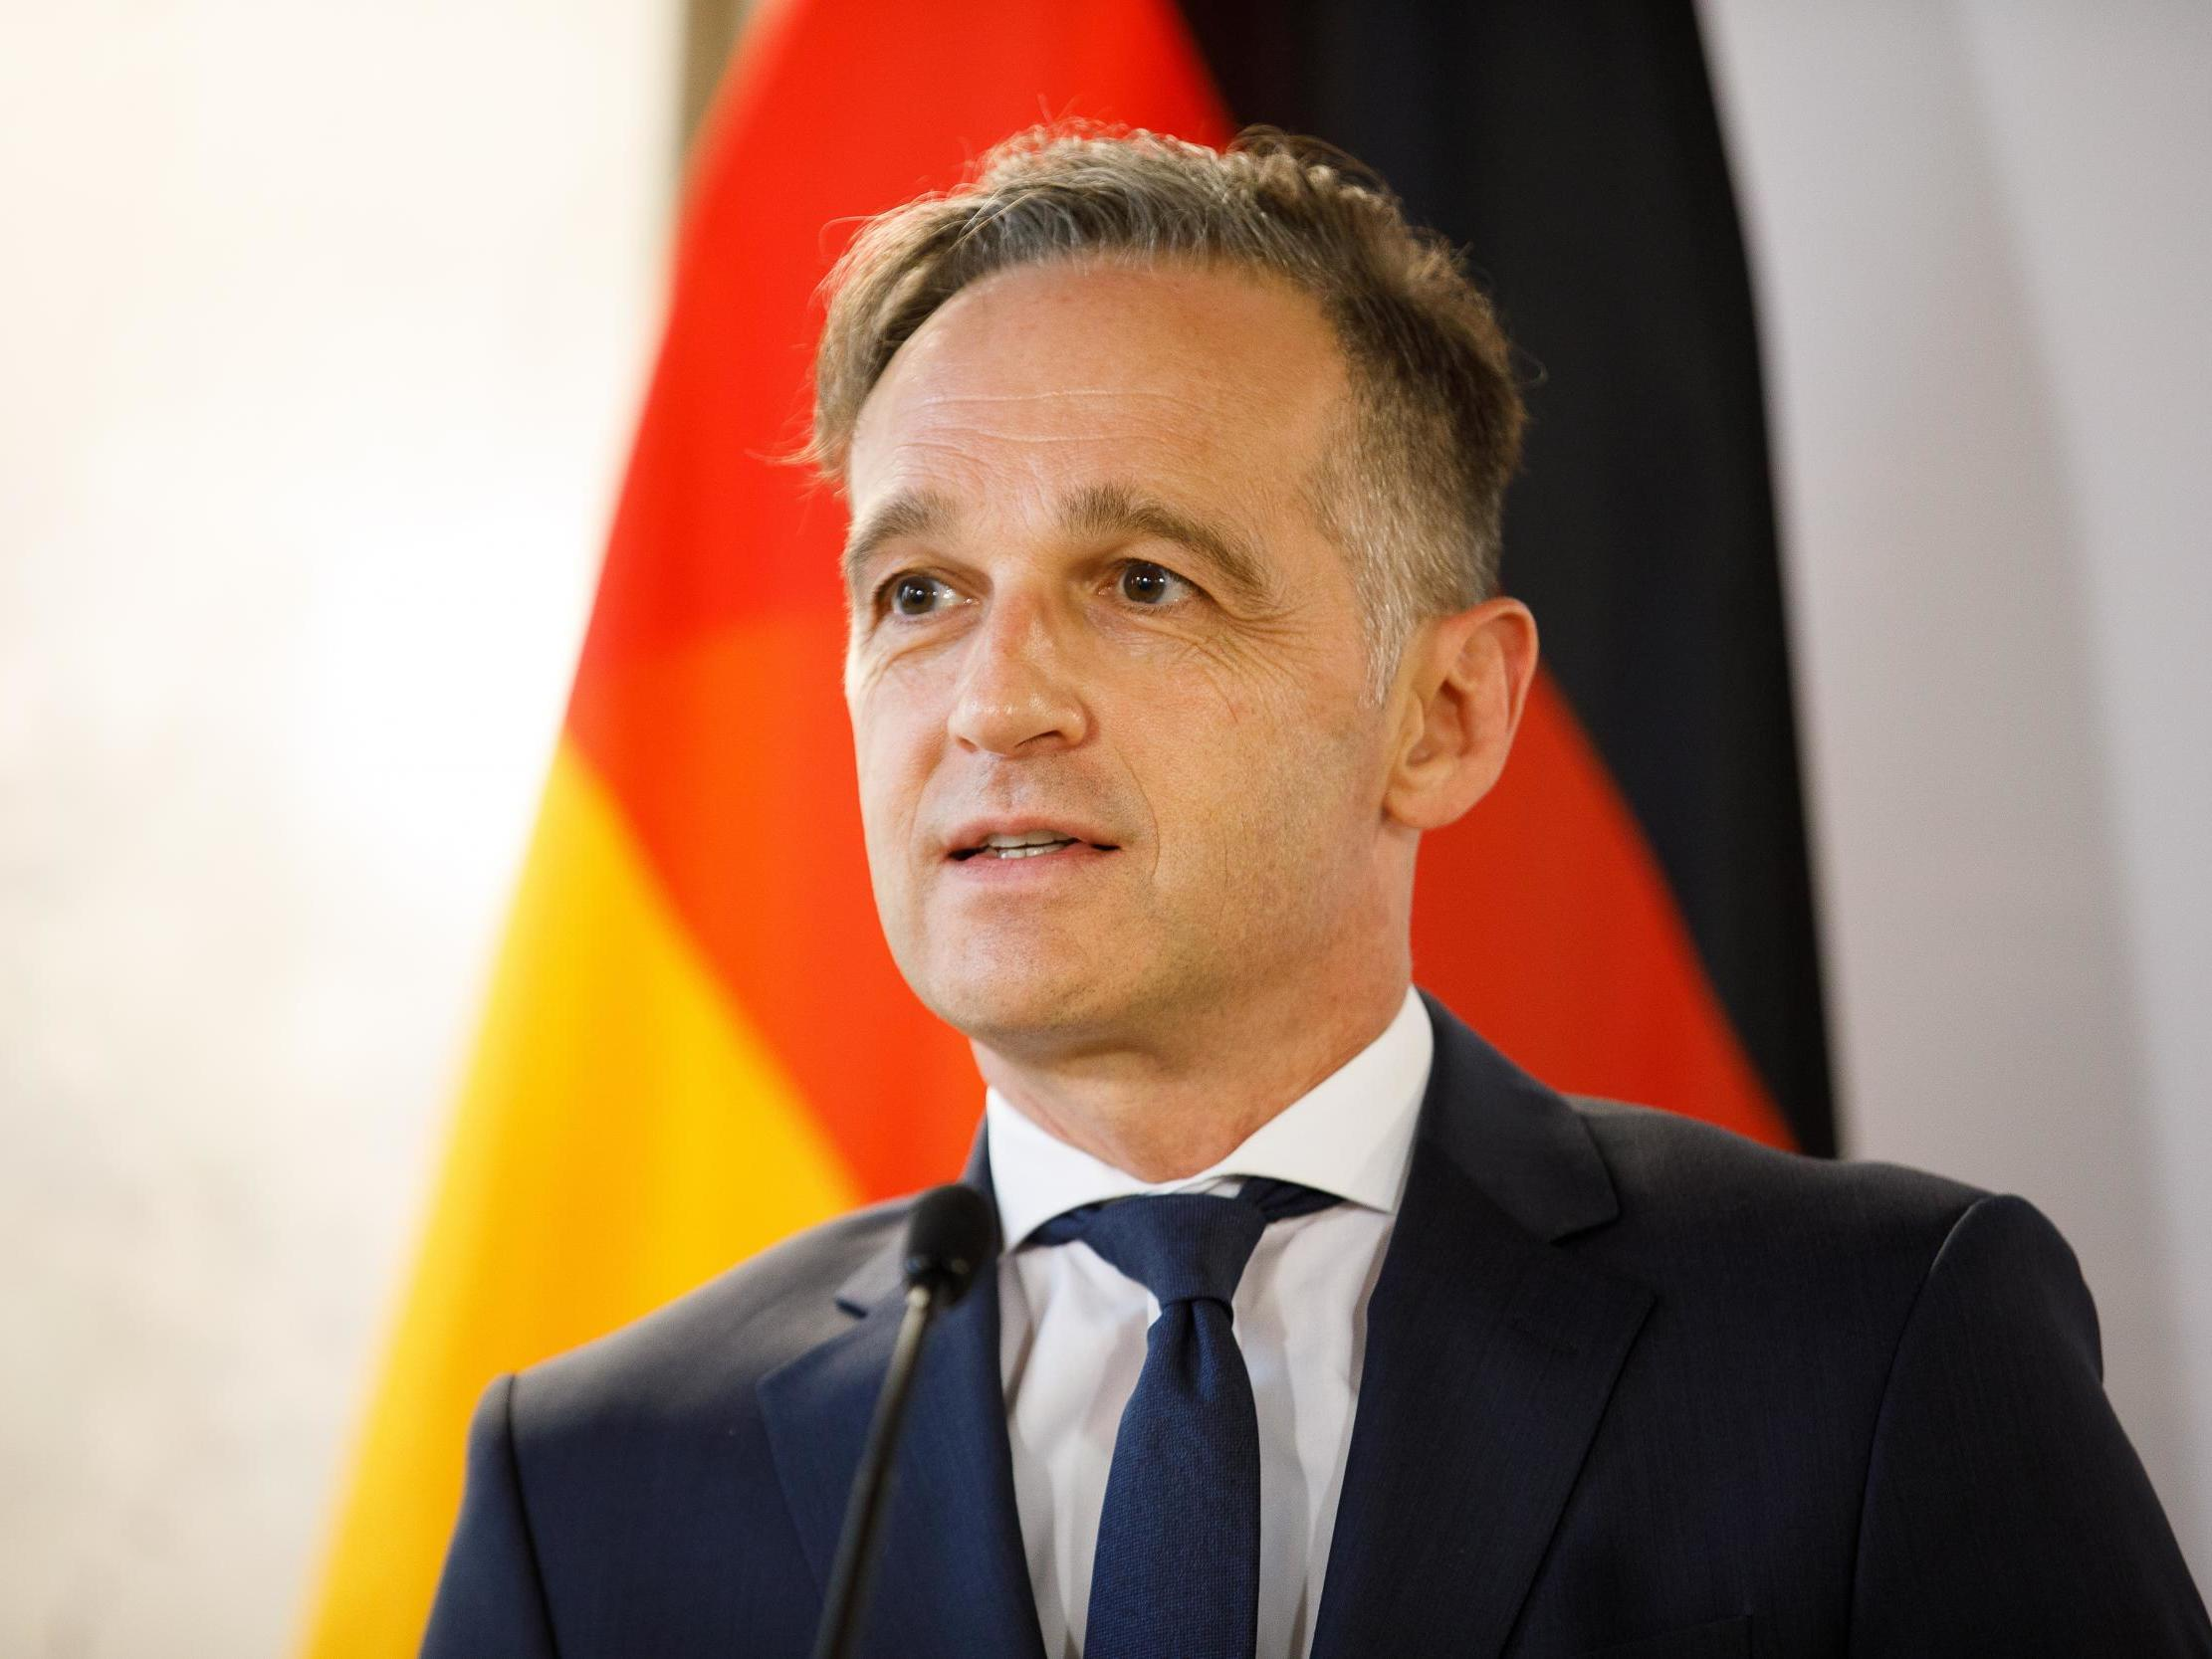 German minister says a Trump defeat in November won't undo damage to transatlantic ties